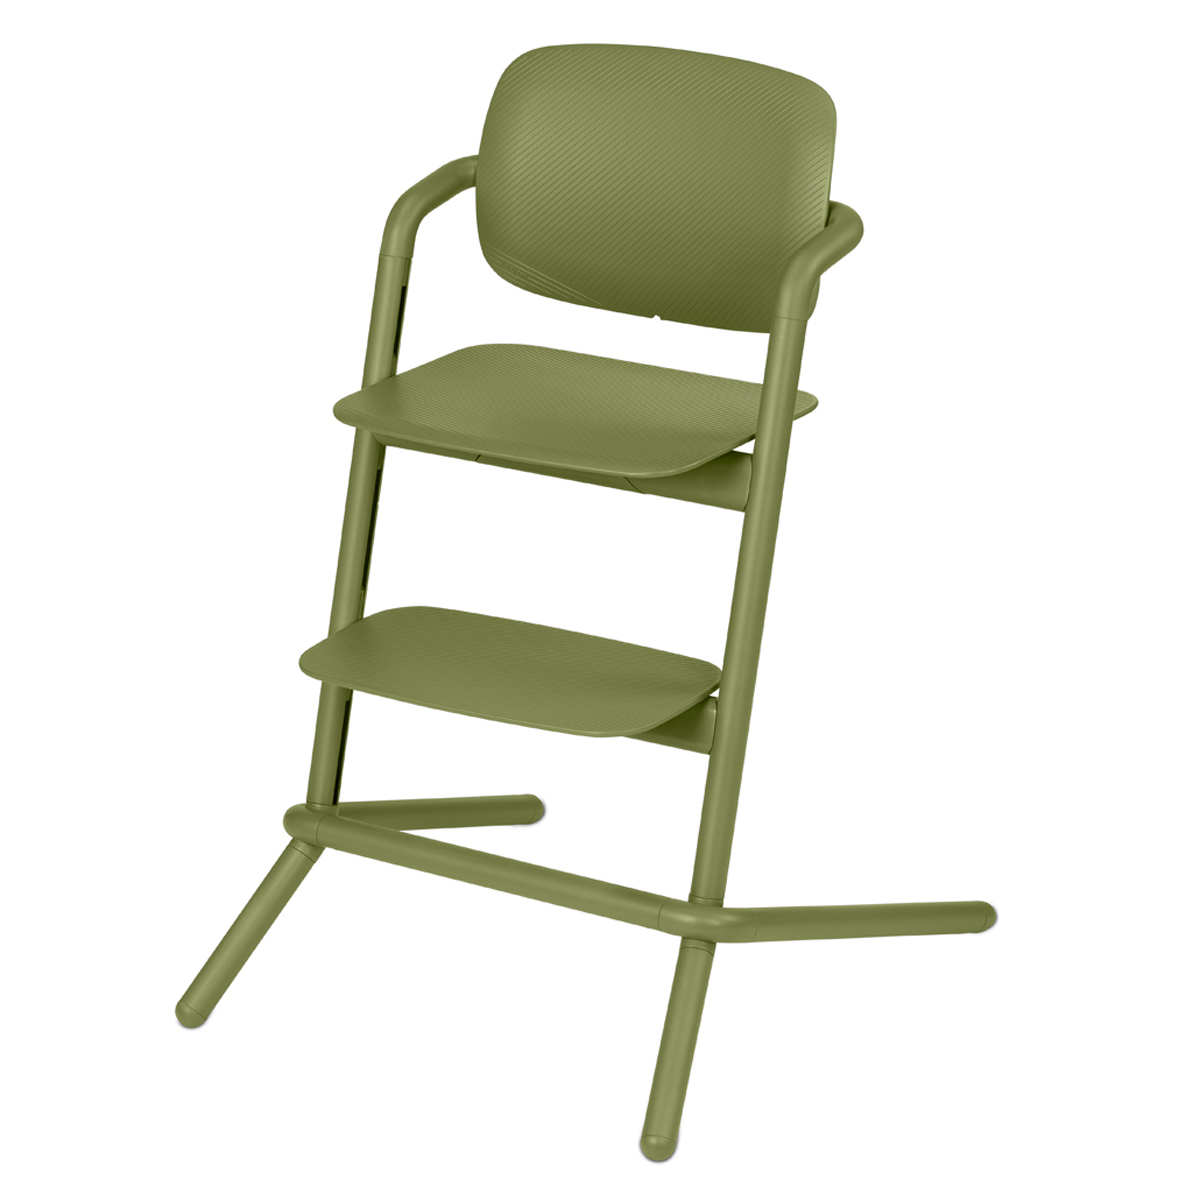 Chaise haute Chaise Haute Lemo - Outback Green Chaise Haute Lemo - Outback Green